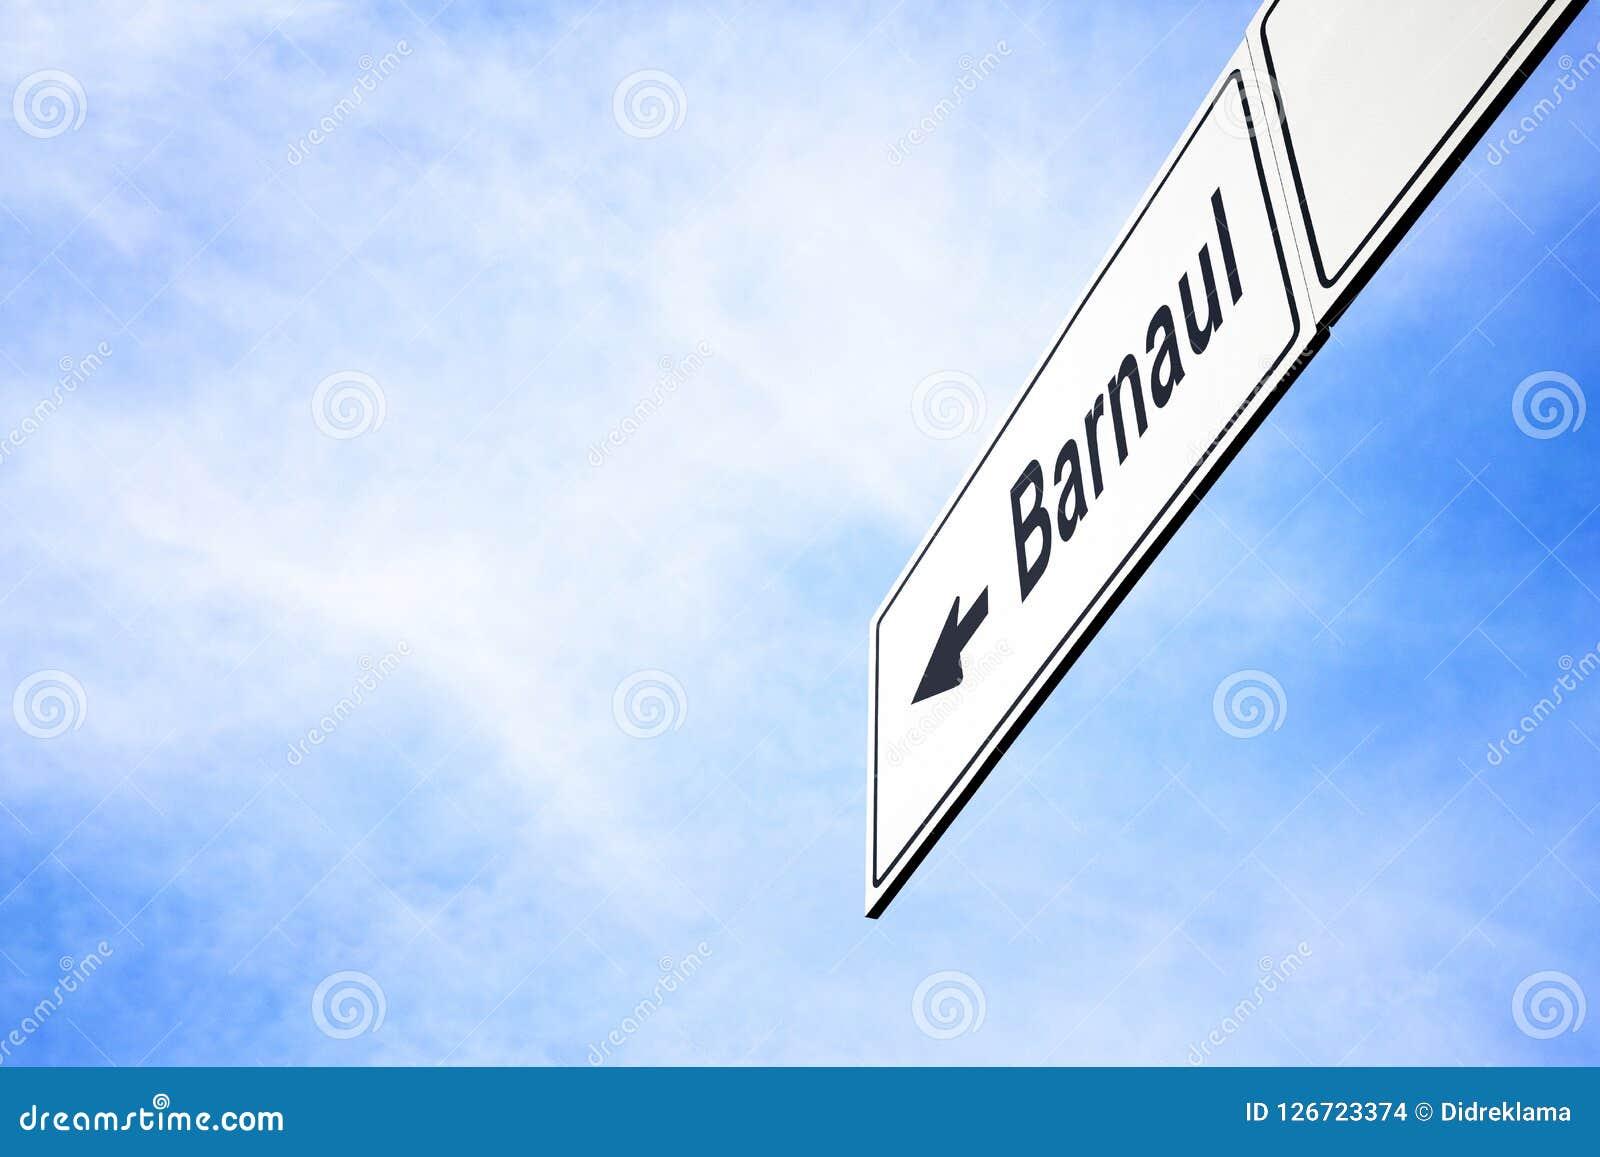 Signboard pointing towards Barnaul